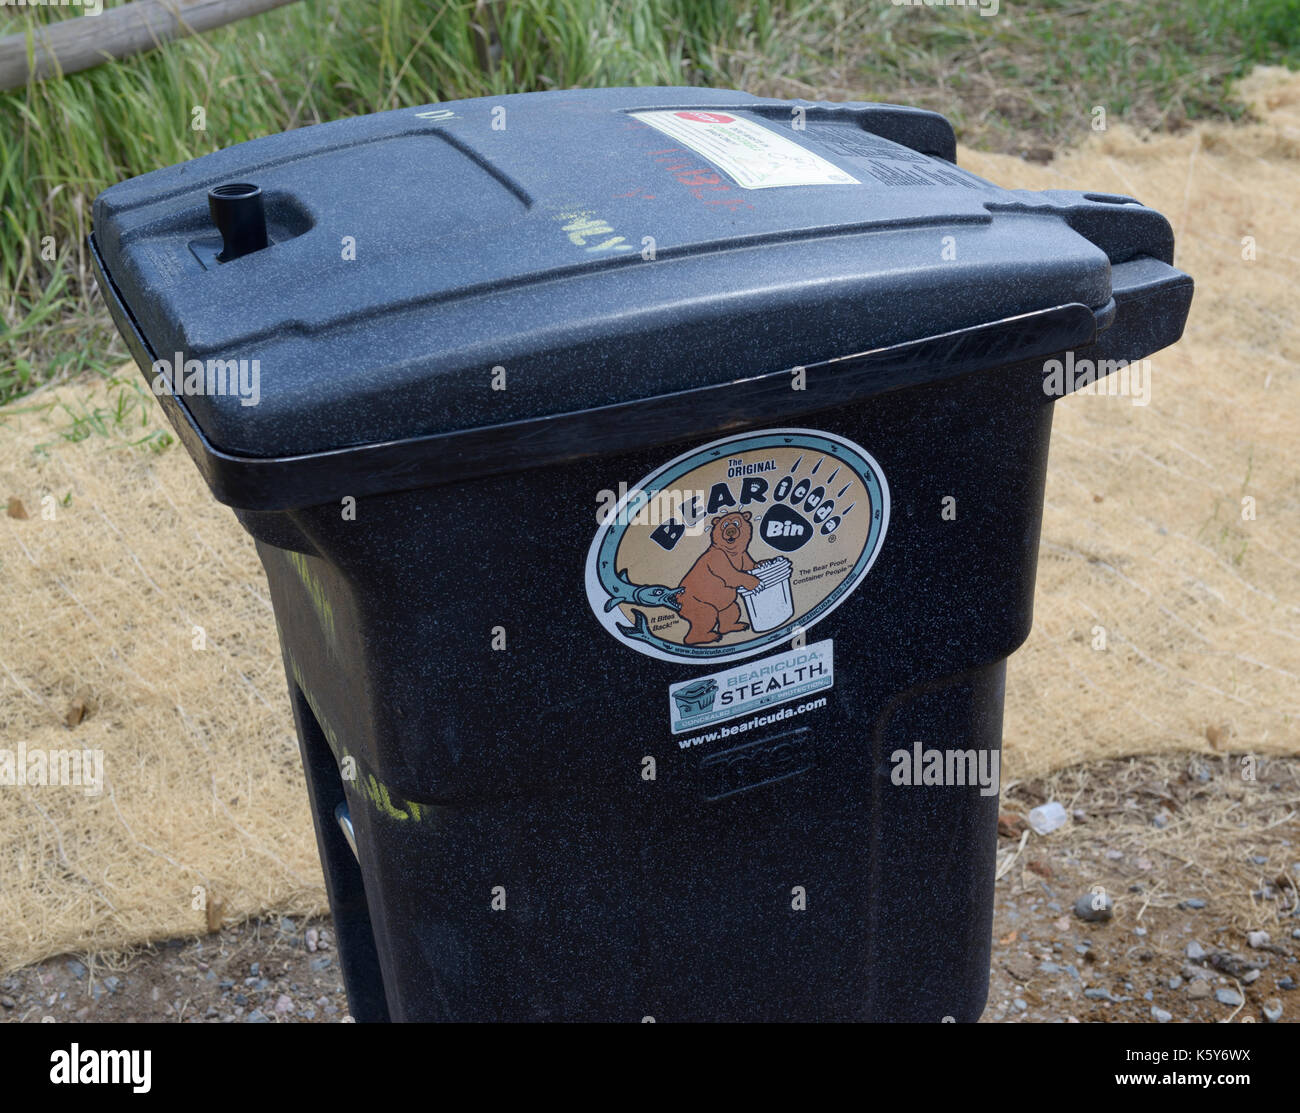 Bear proof garbage bin - Stock Image